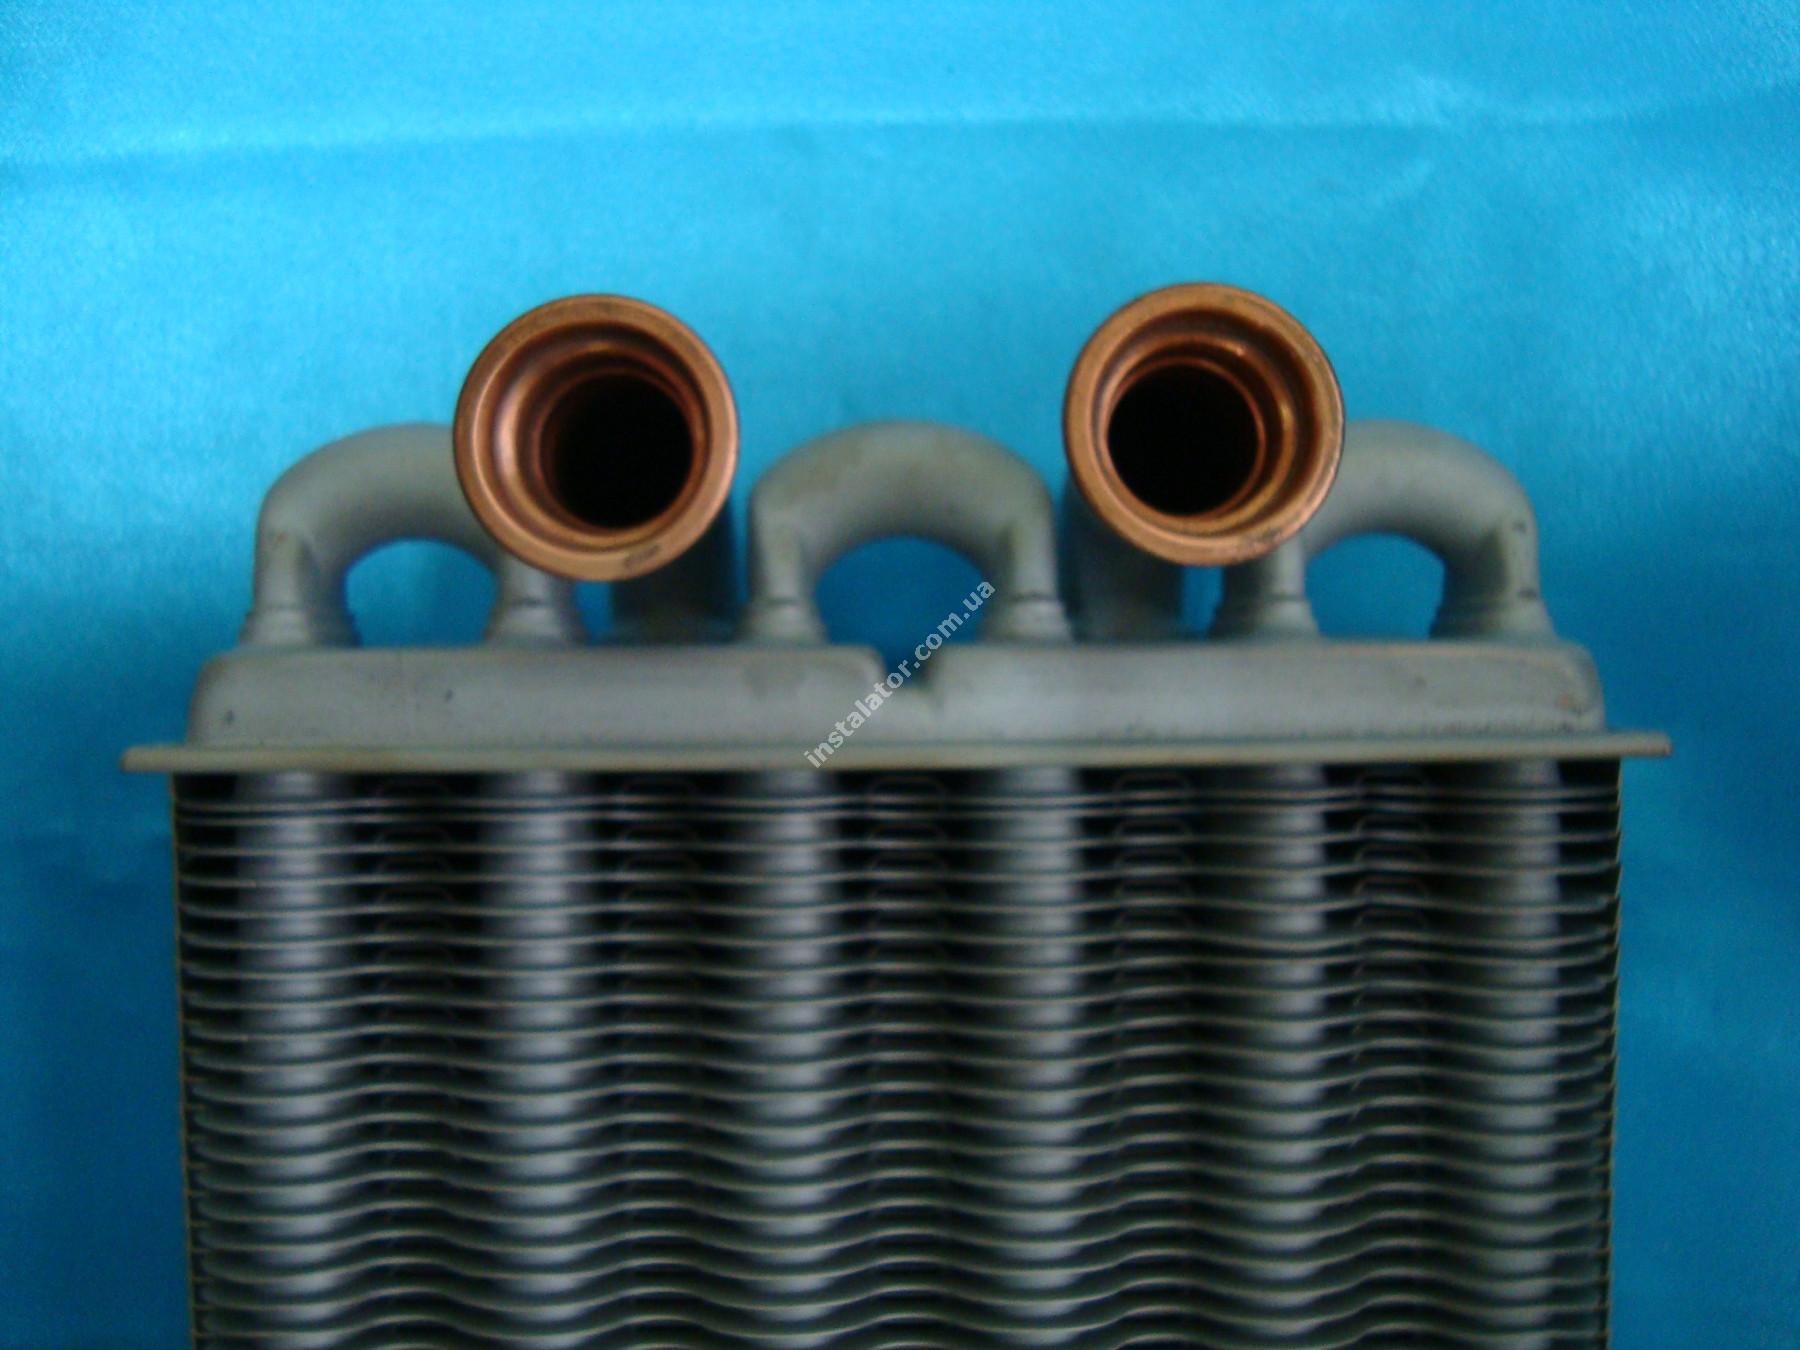 39820060 Теплообменник битермический  Ferroli DOMIPROJECT C24, FerEasy C24 (дым) full-image-3